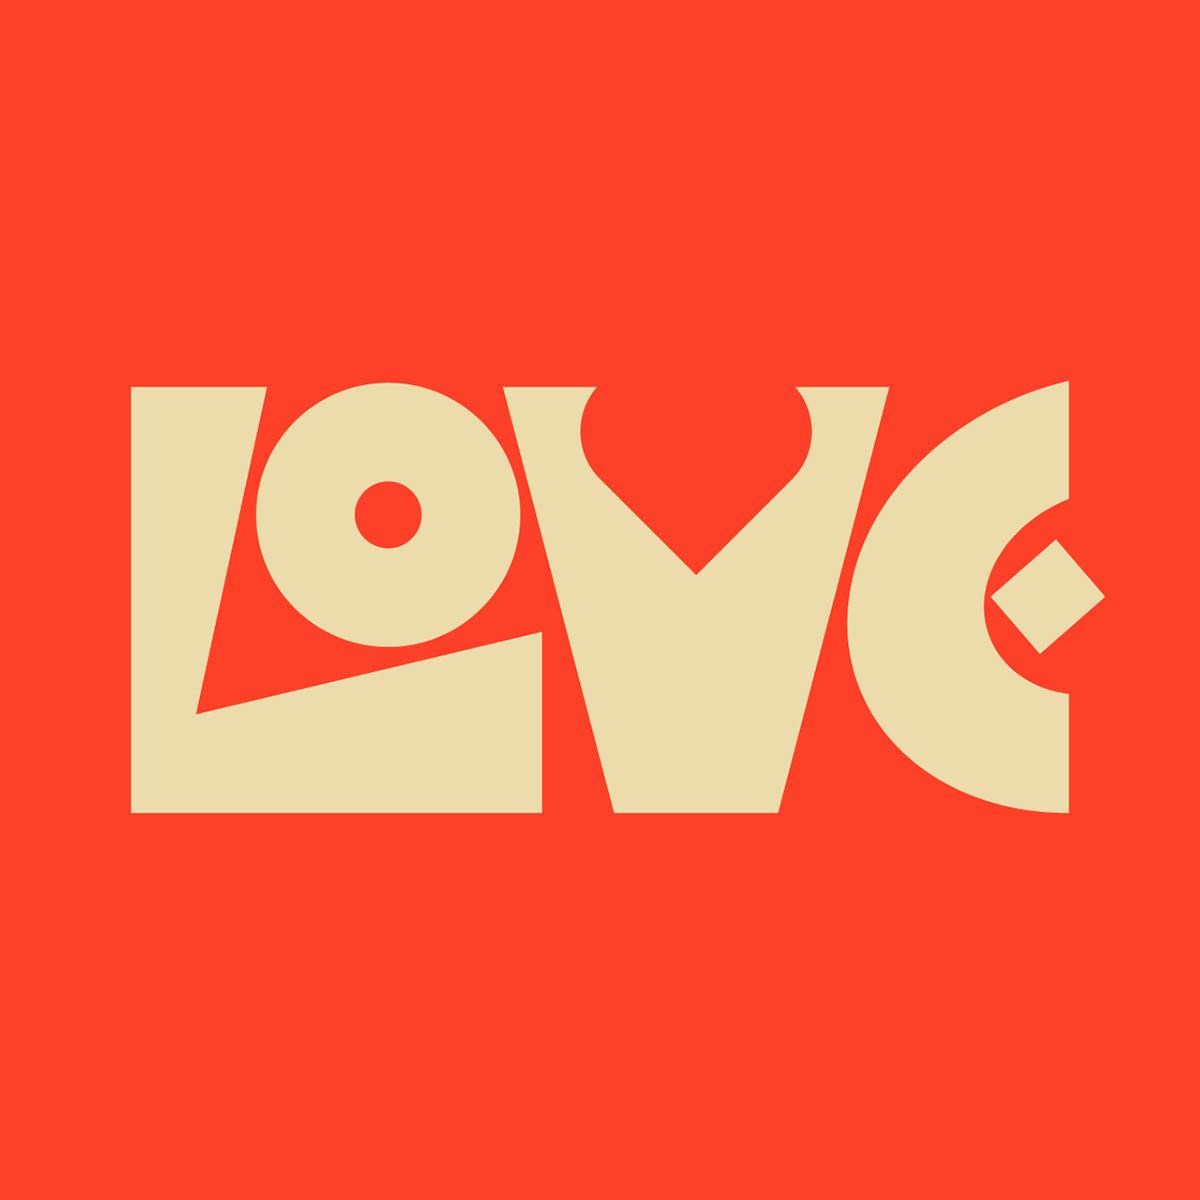 apple,Coffee,deus ex machina,google,japan,Love,McDonalds,pepsi,supreme,windows 95